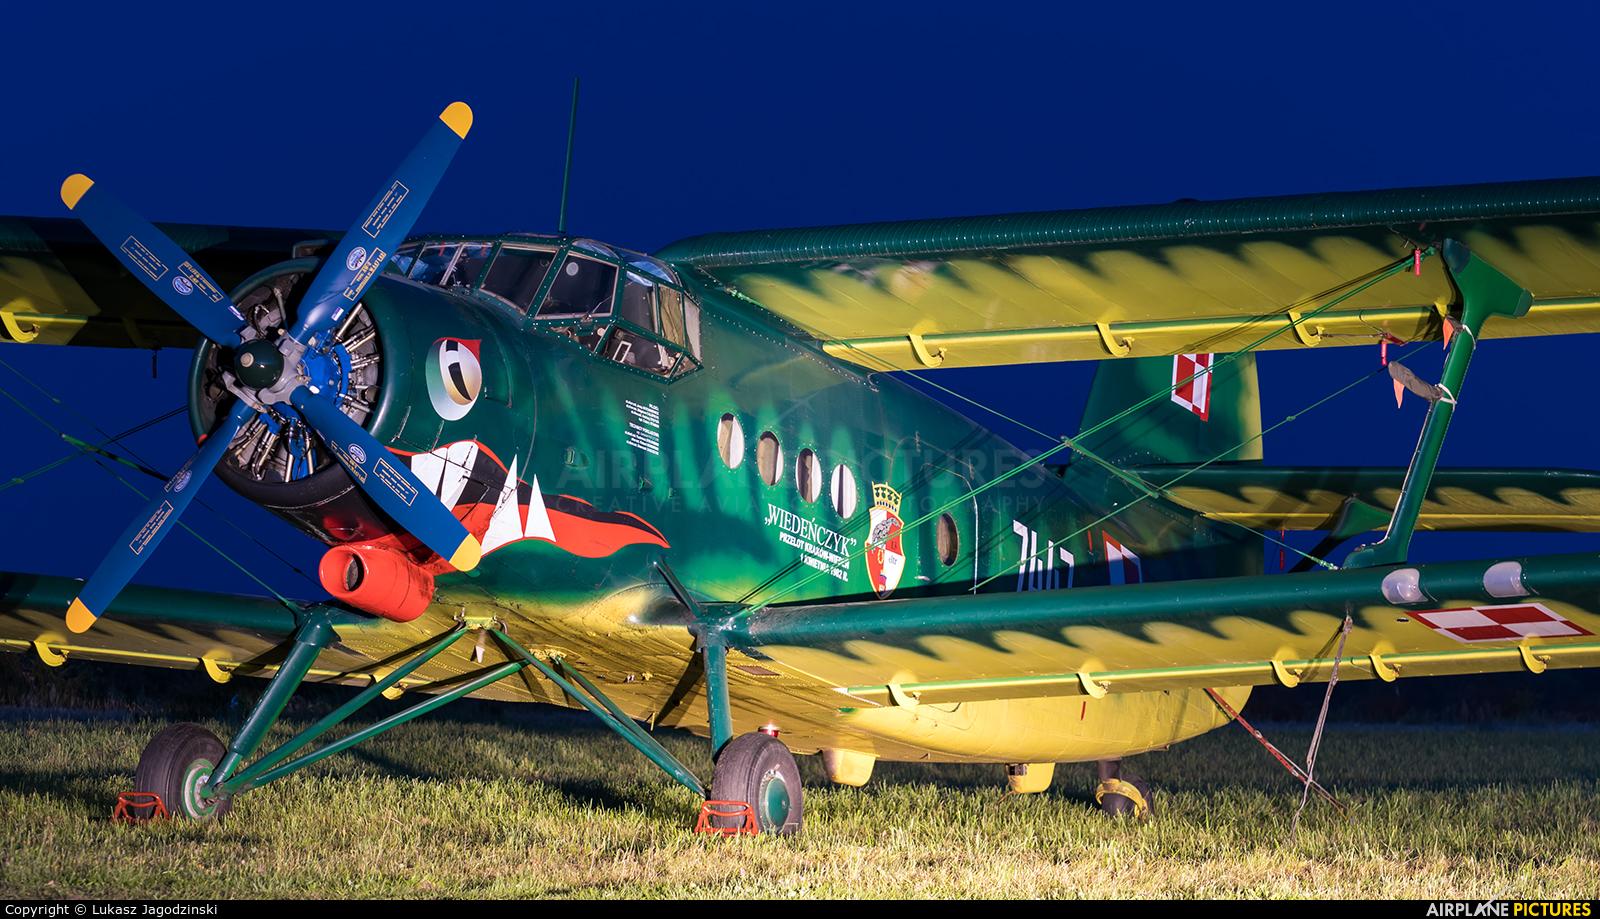 Poland - Air Force 7447 aircraft at Kętrzyn - Wilamowo